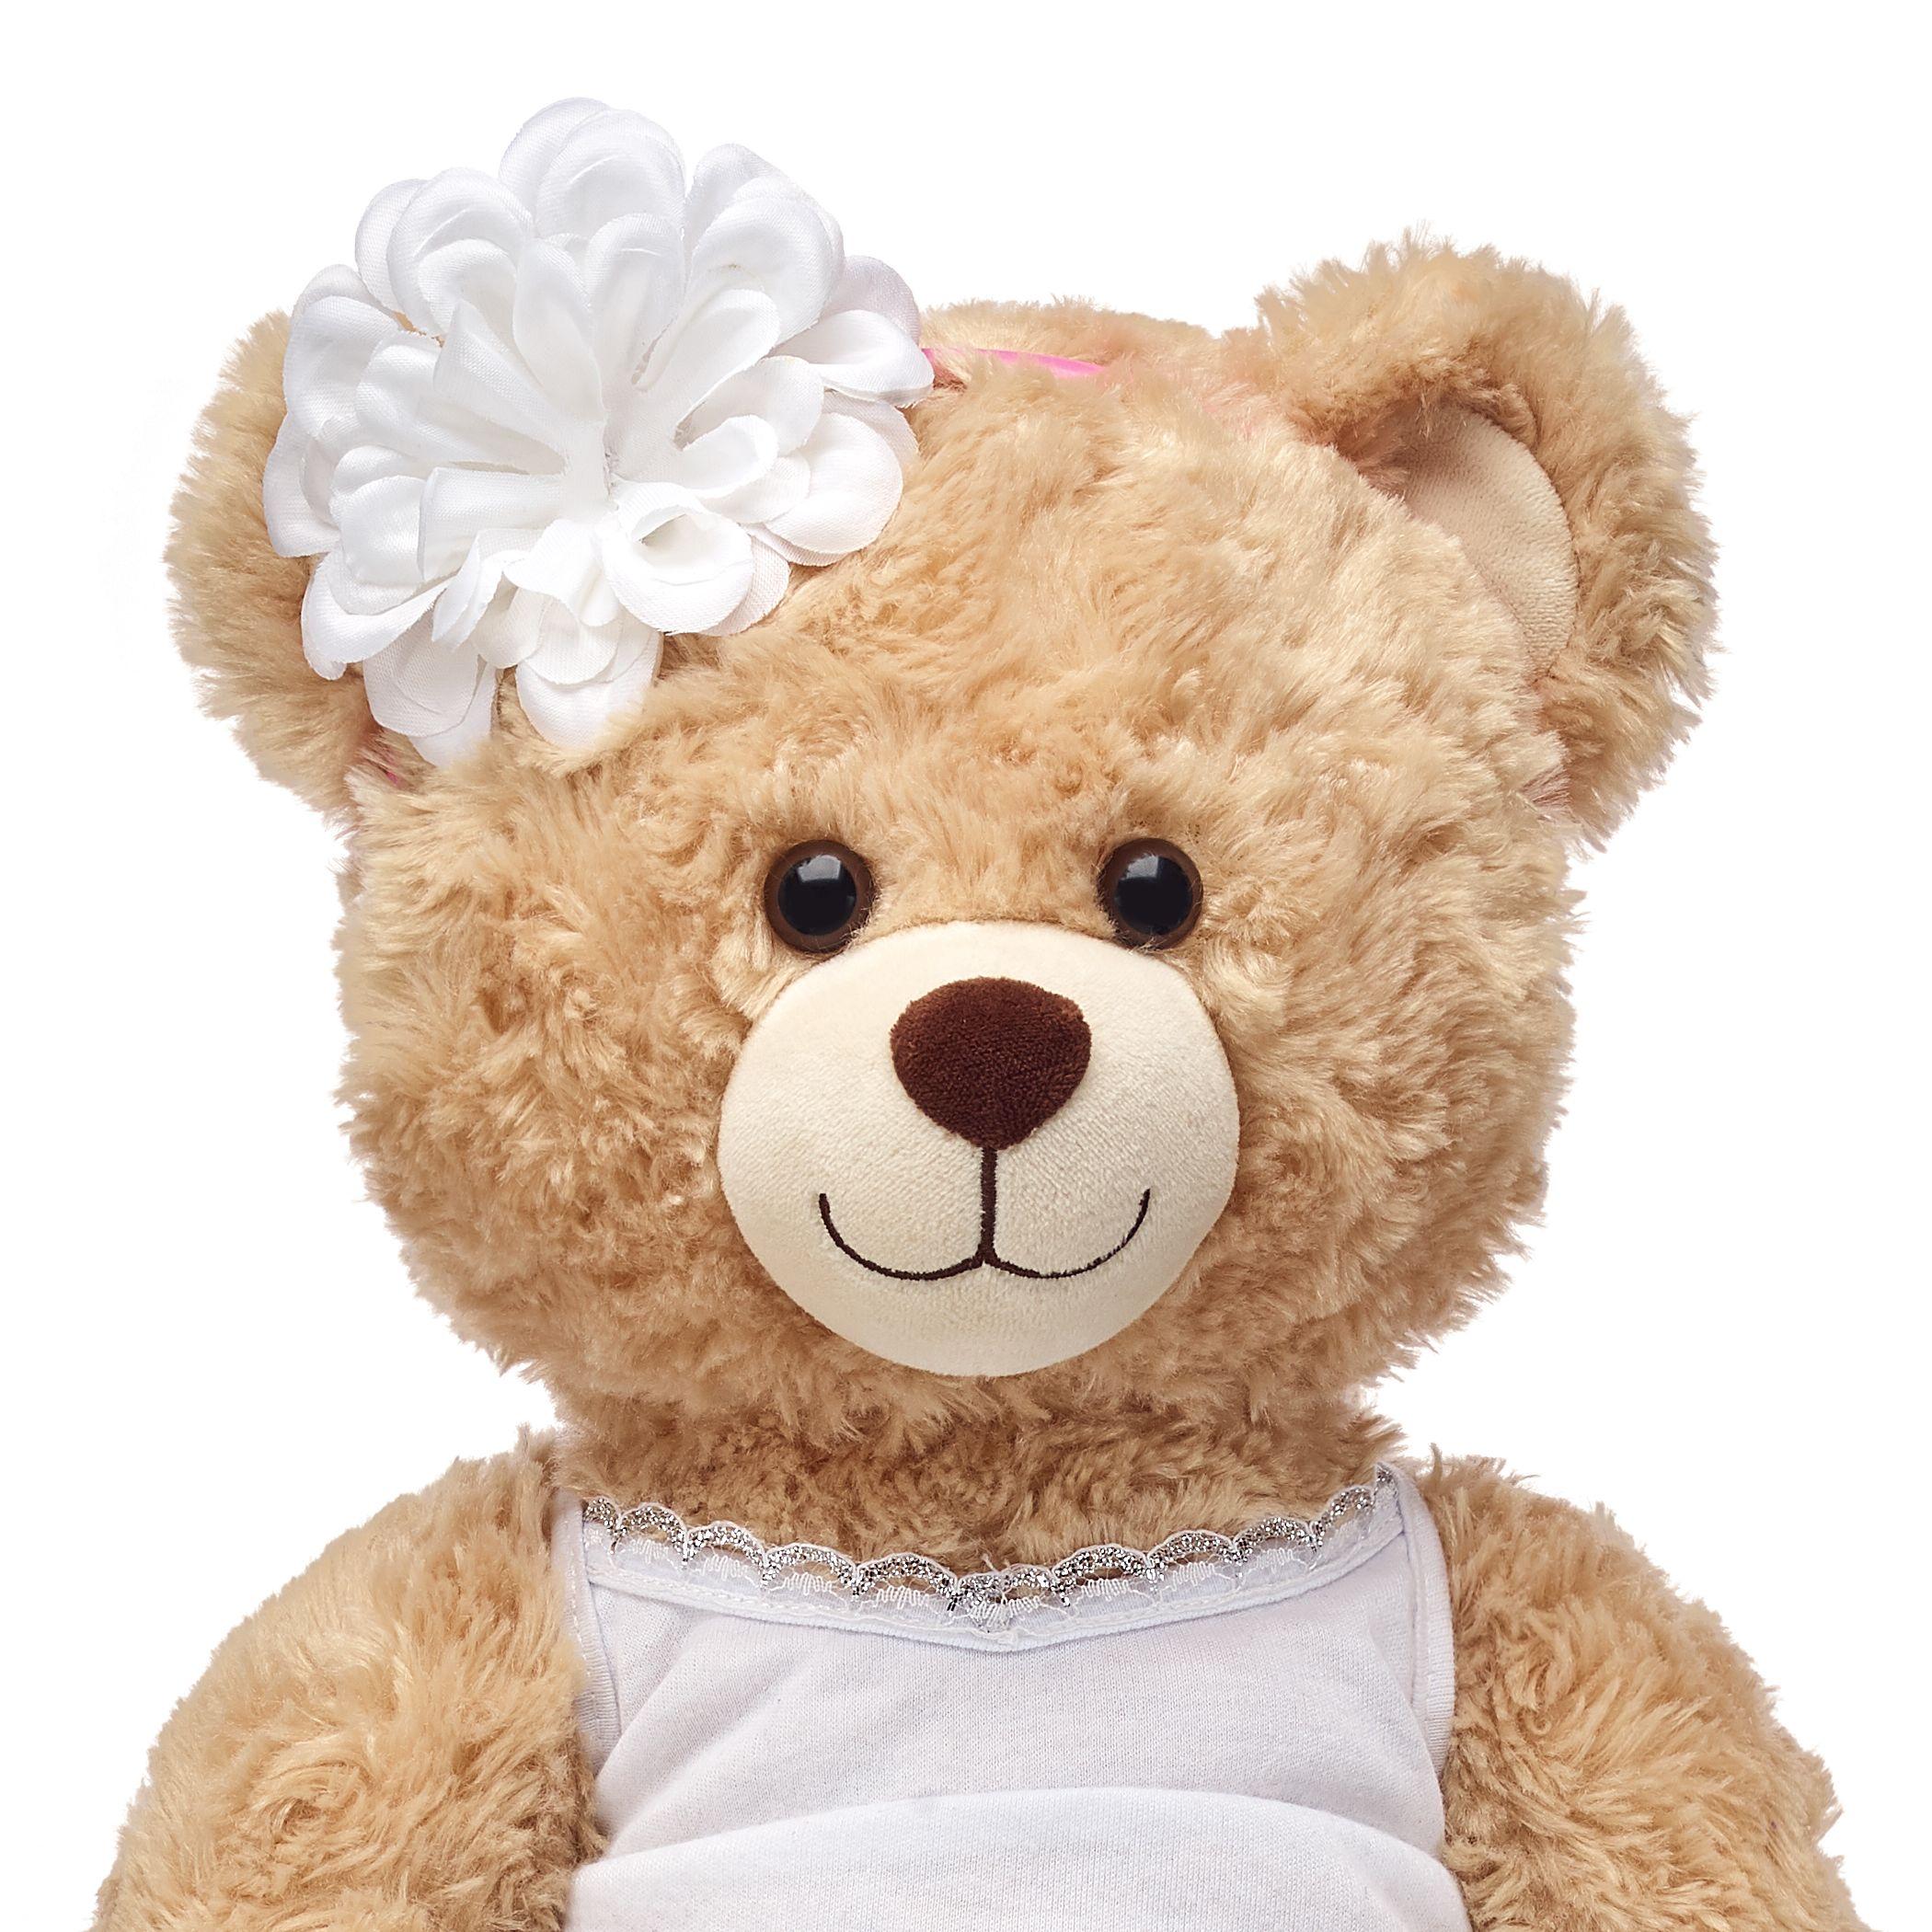 White Flower Headband Bear Stuffed Animal Small Teddy Bears Baby Plush [ 2100 x 2100 Pixel ]